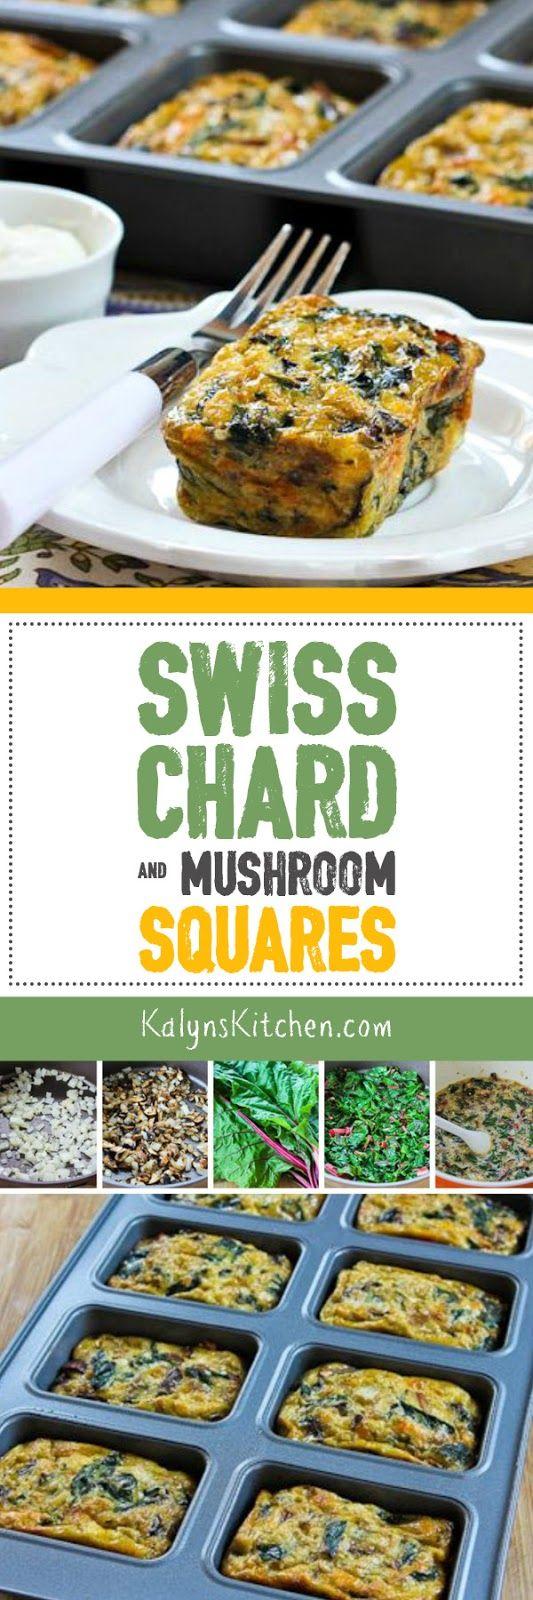 Blue apron low carb - Swiss Chard And Mushroom Squares Lowcarb